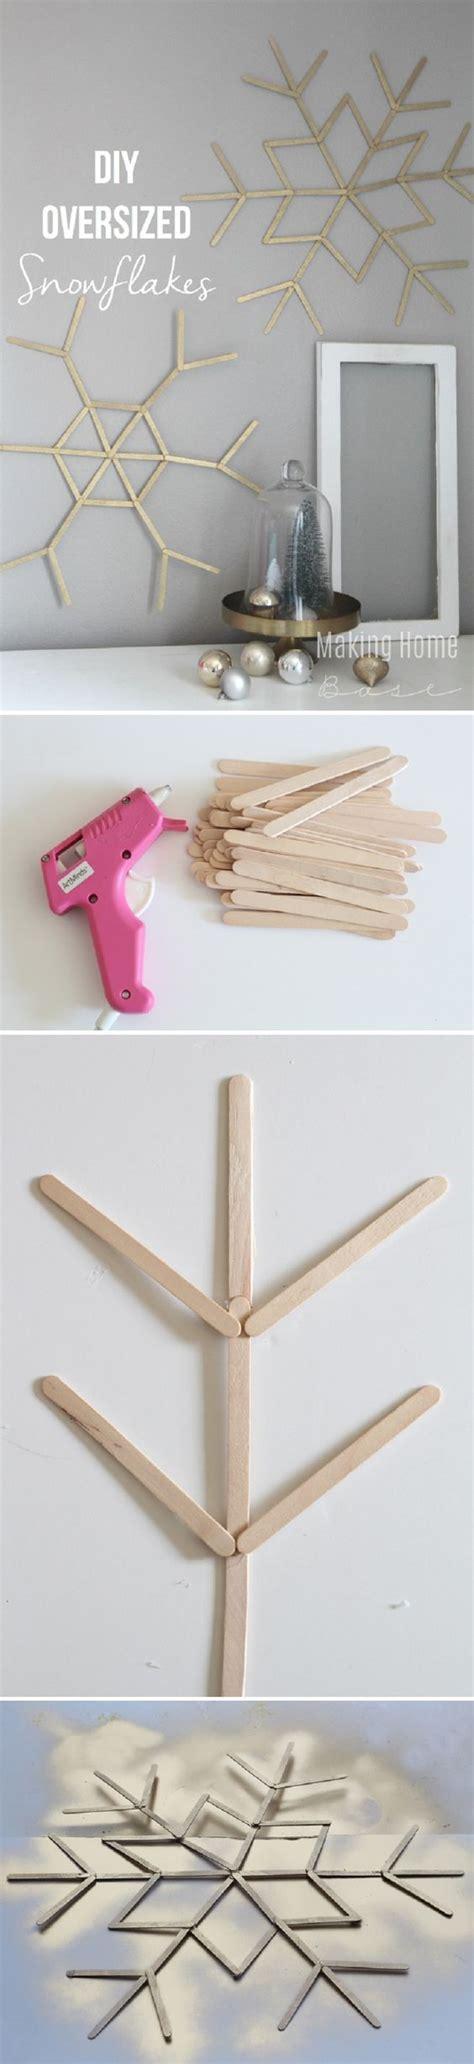 diy decorations sticks 35 creative popsicle stick crafts